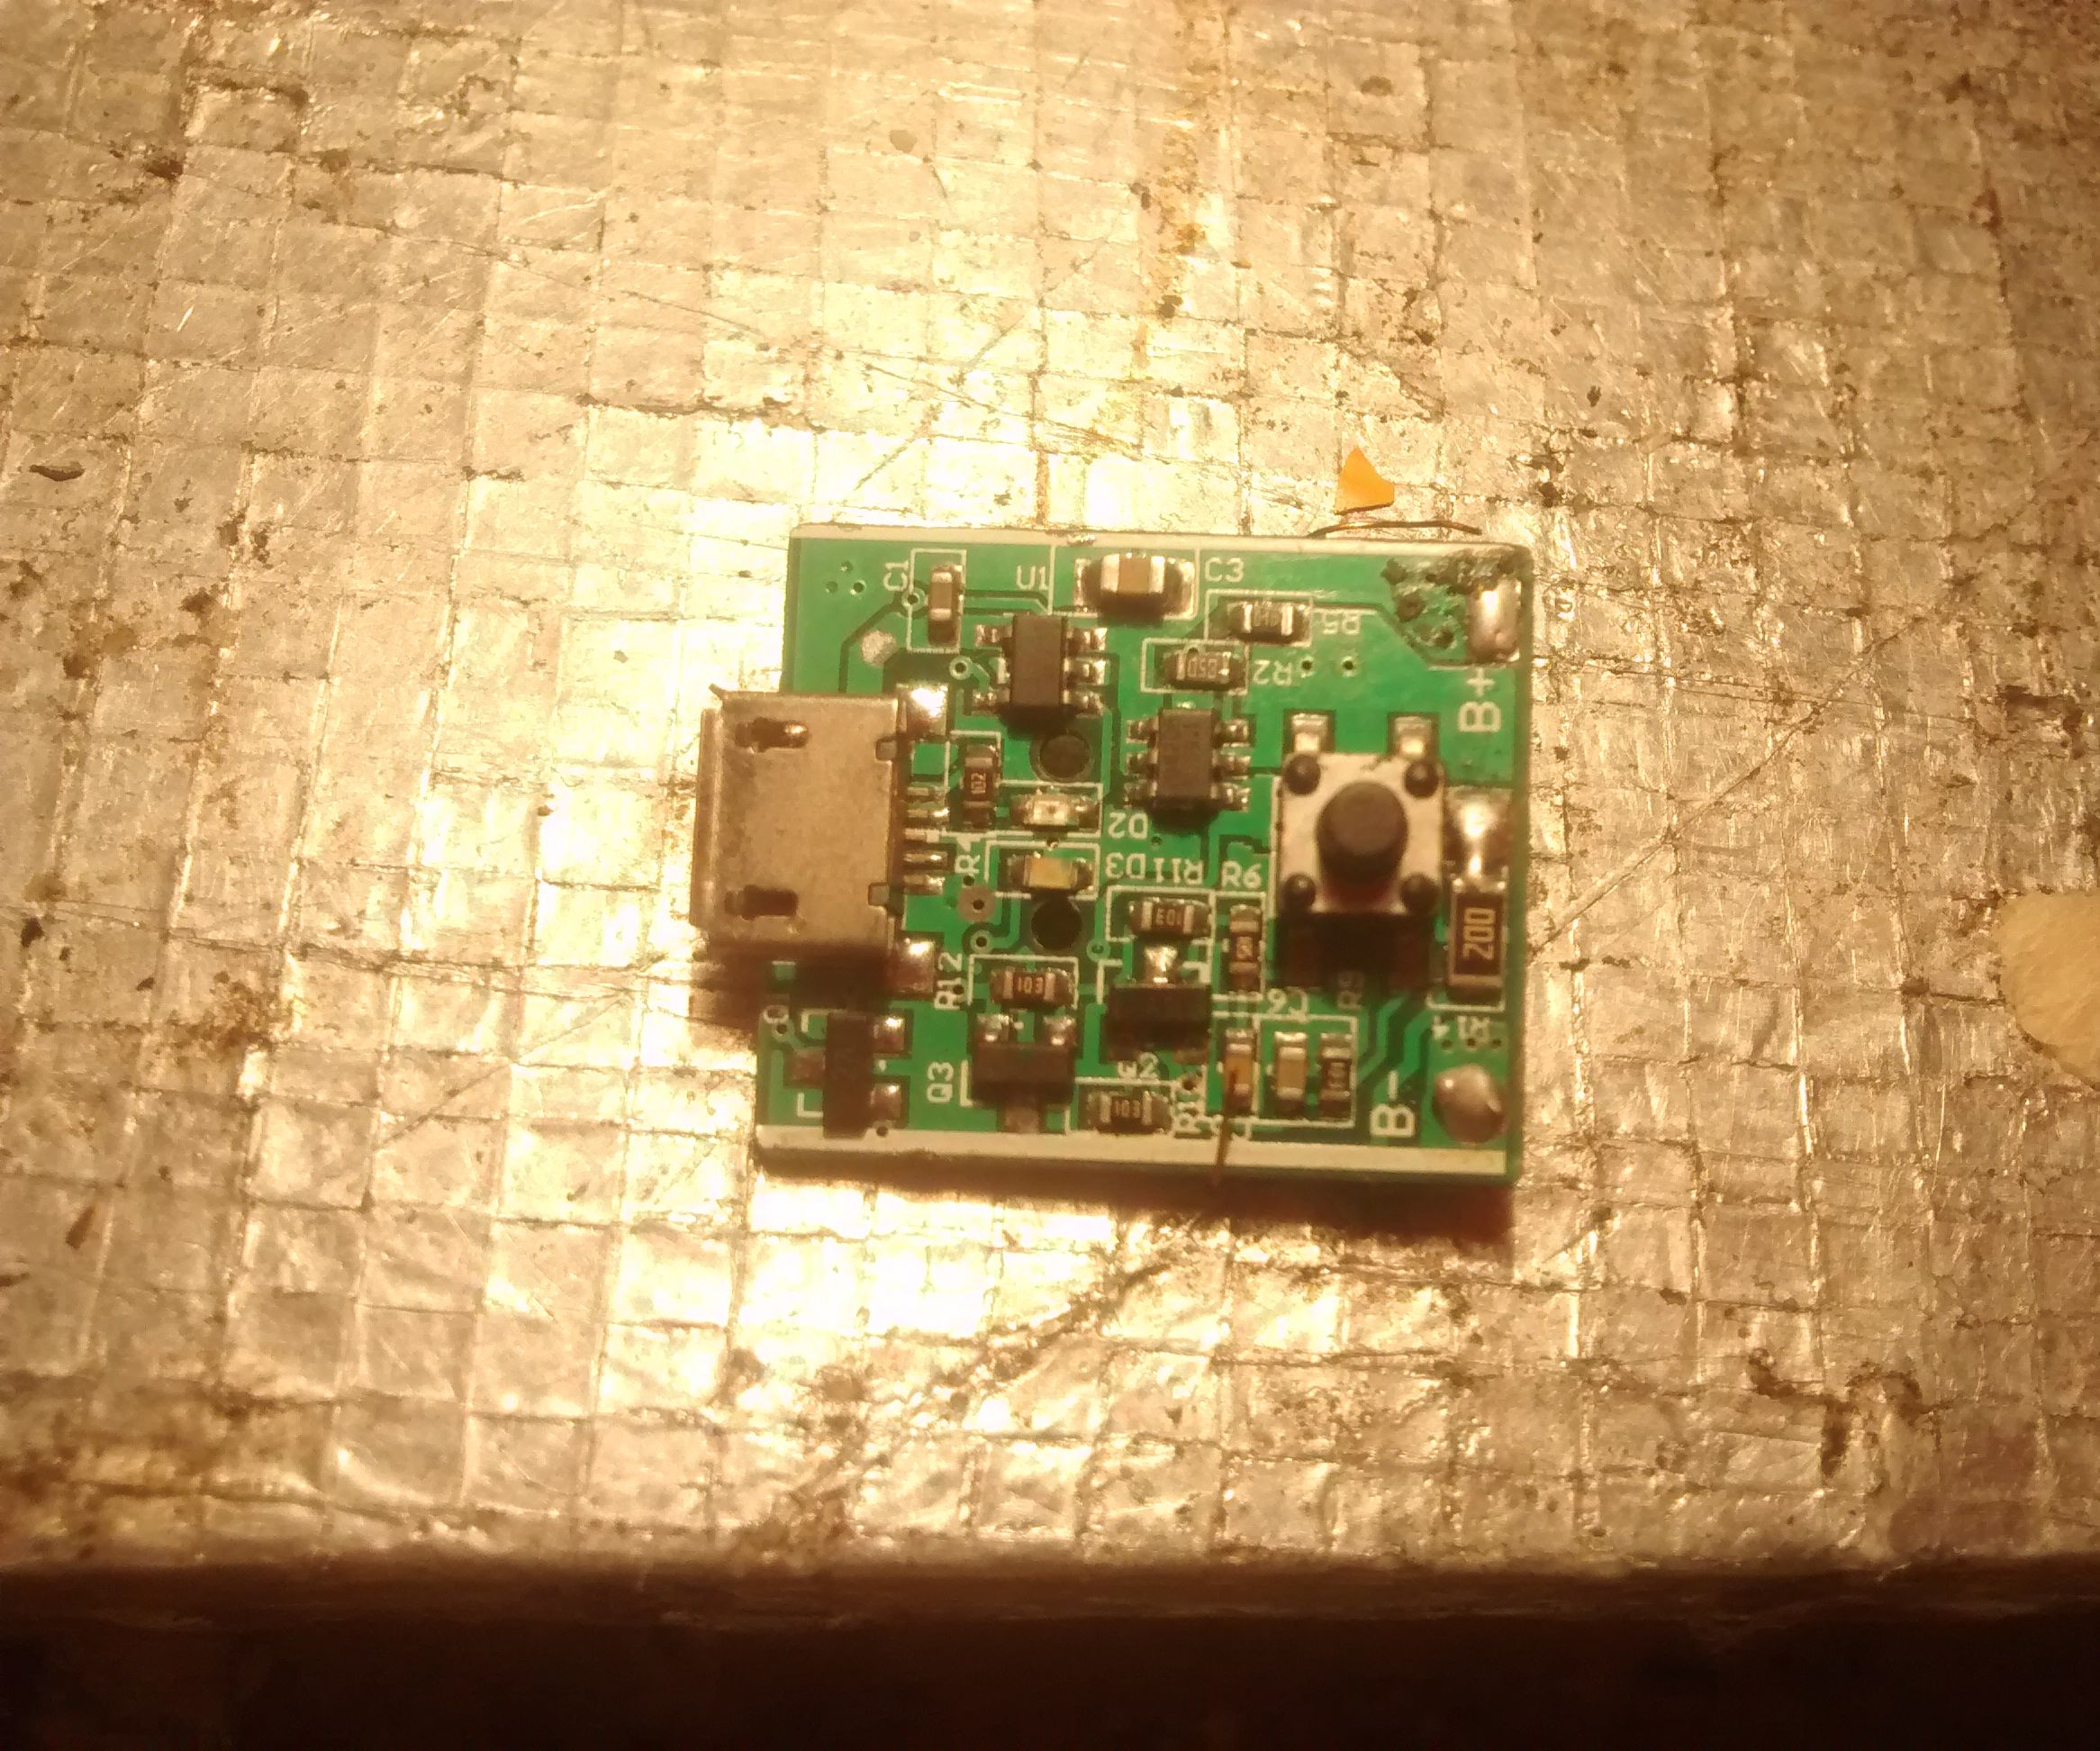 Convert a Power Bank Into a 9v Lithium Battery